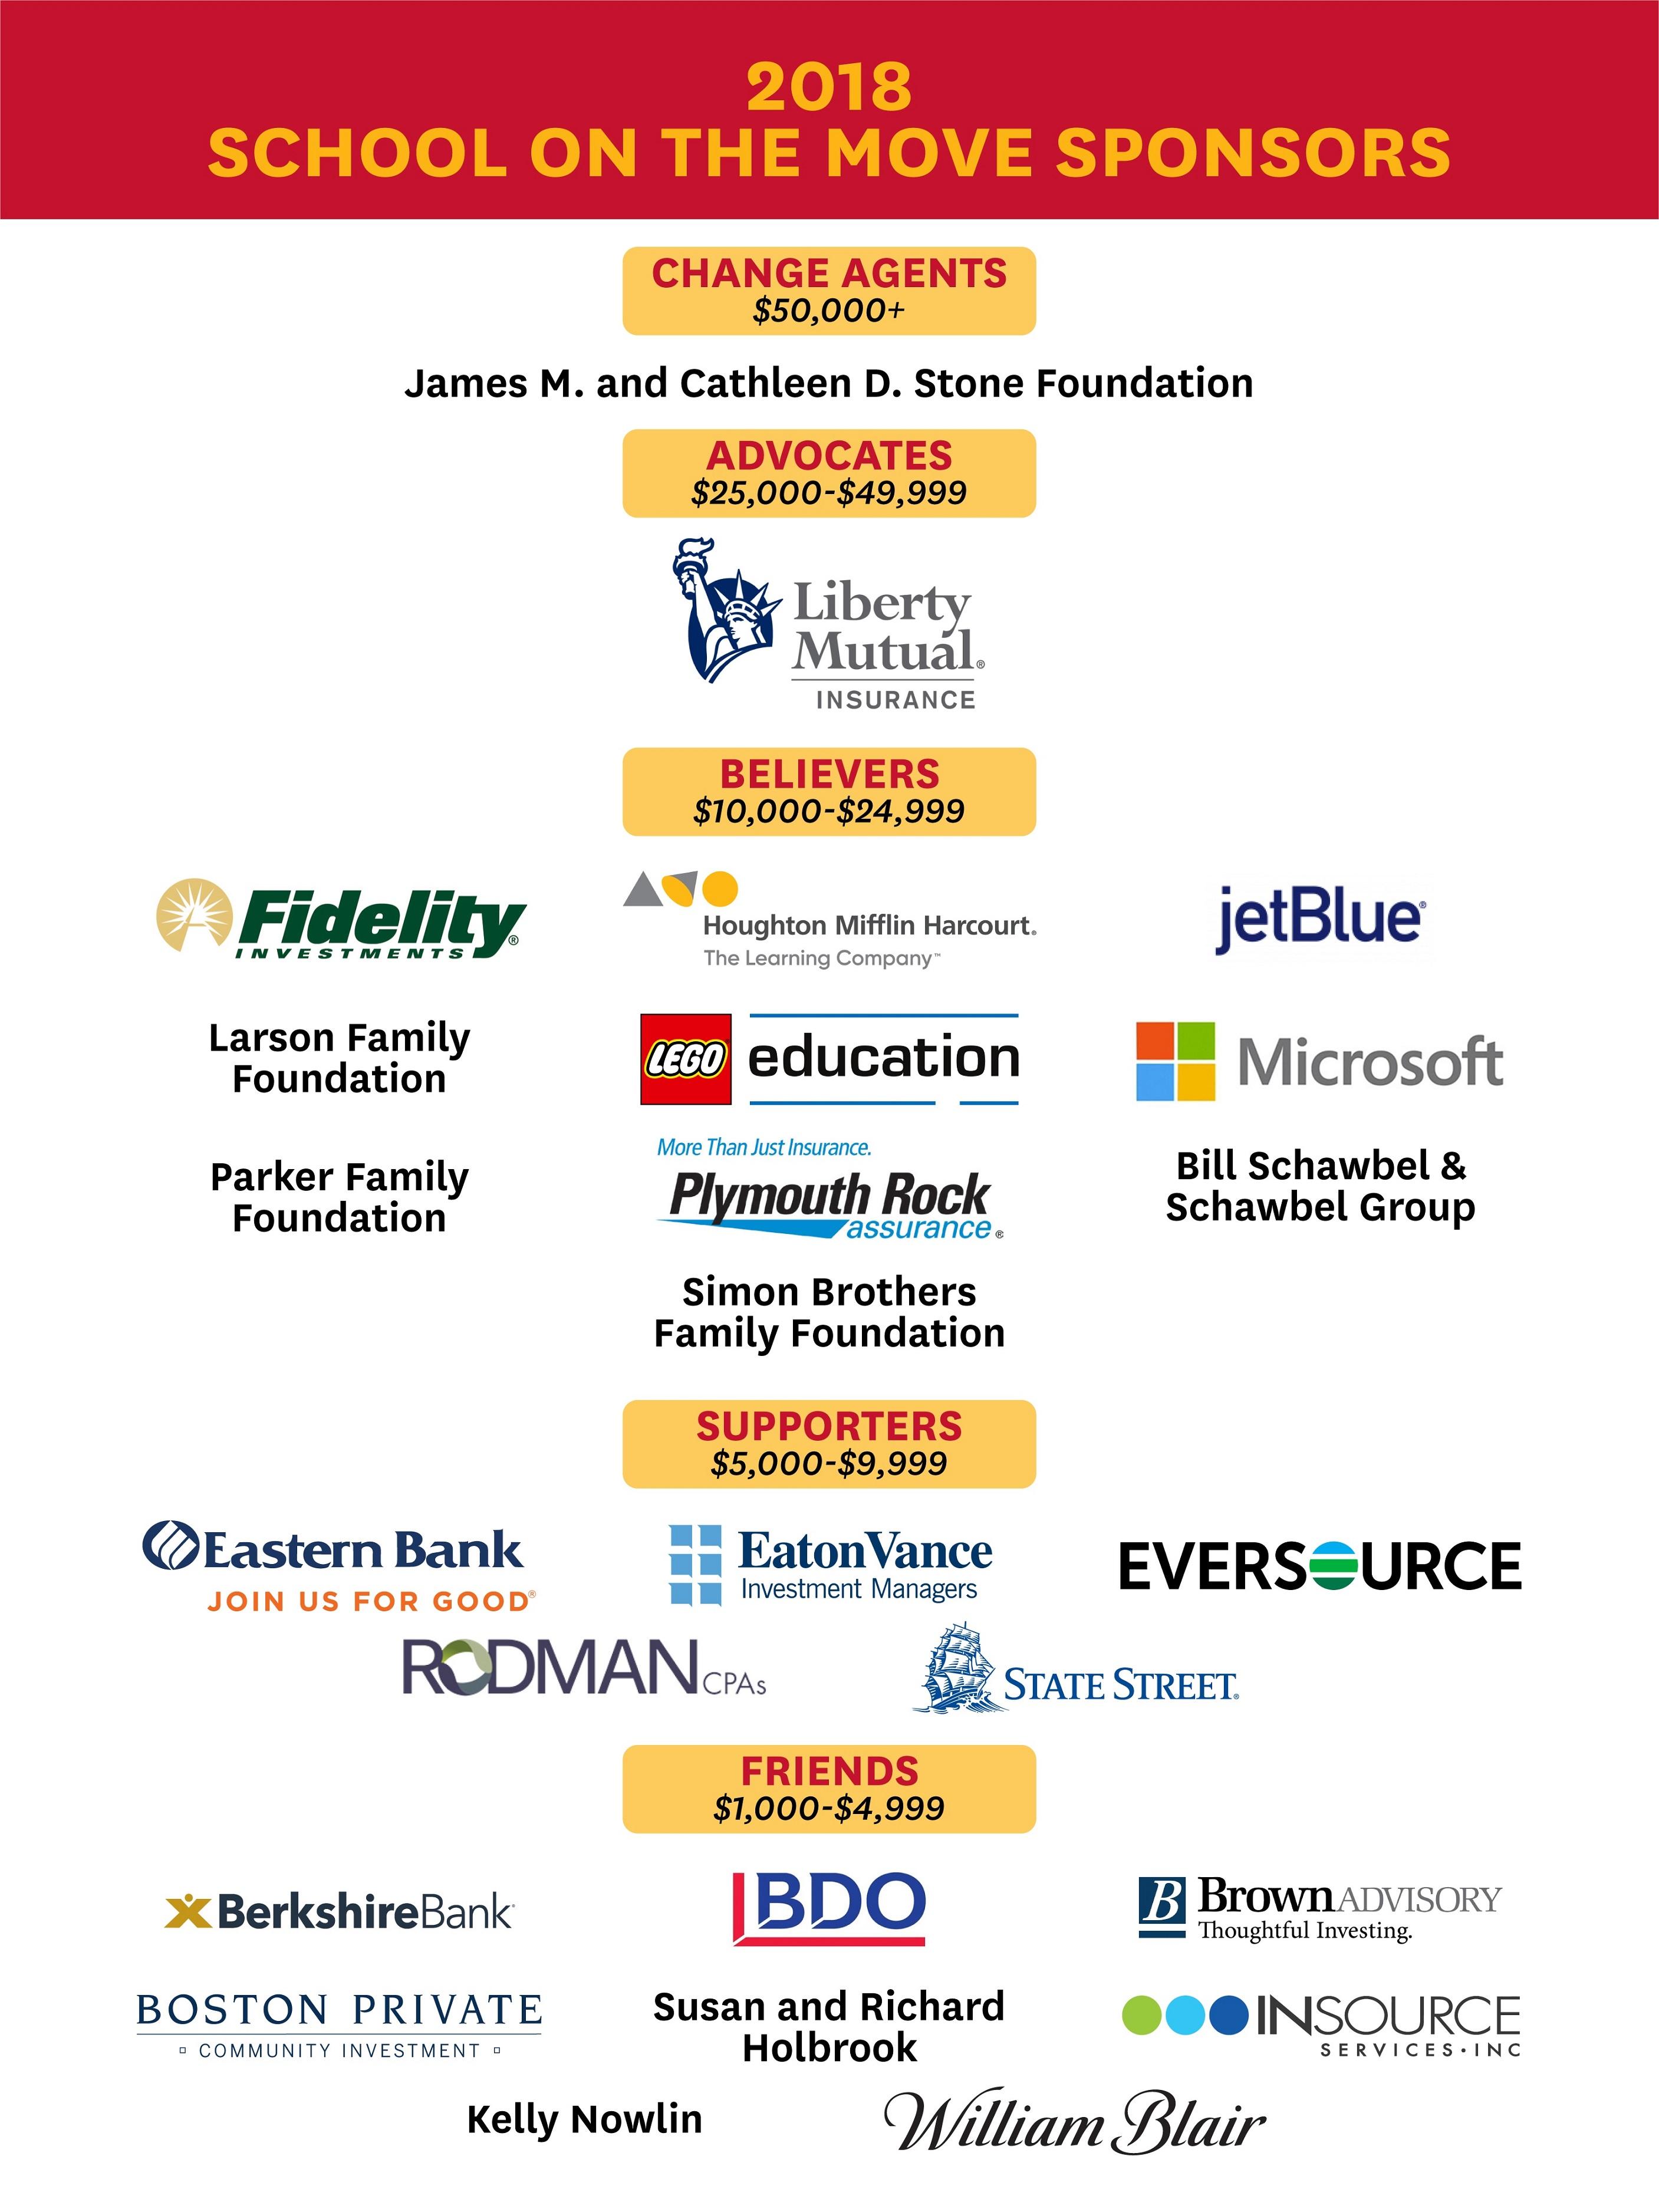 2018 School on the Move Sponsors